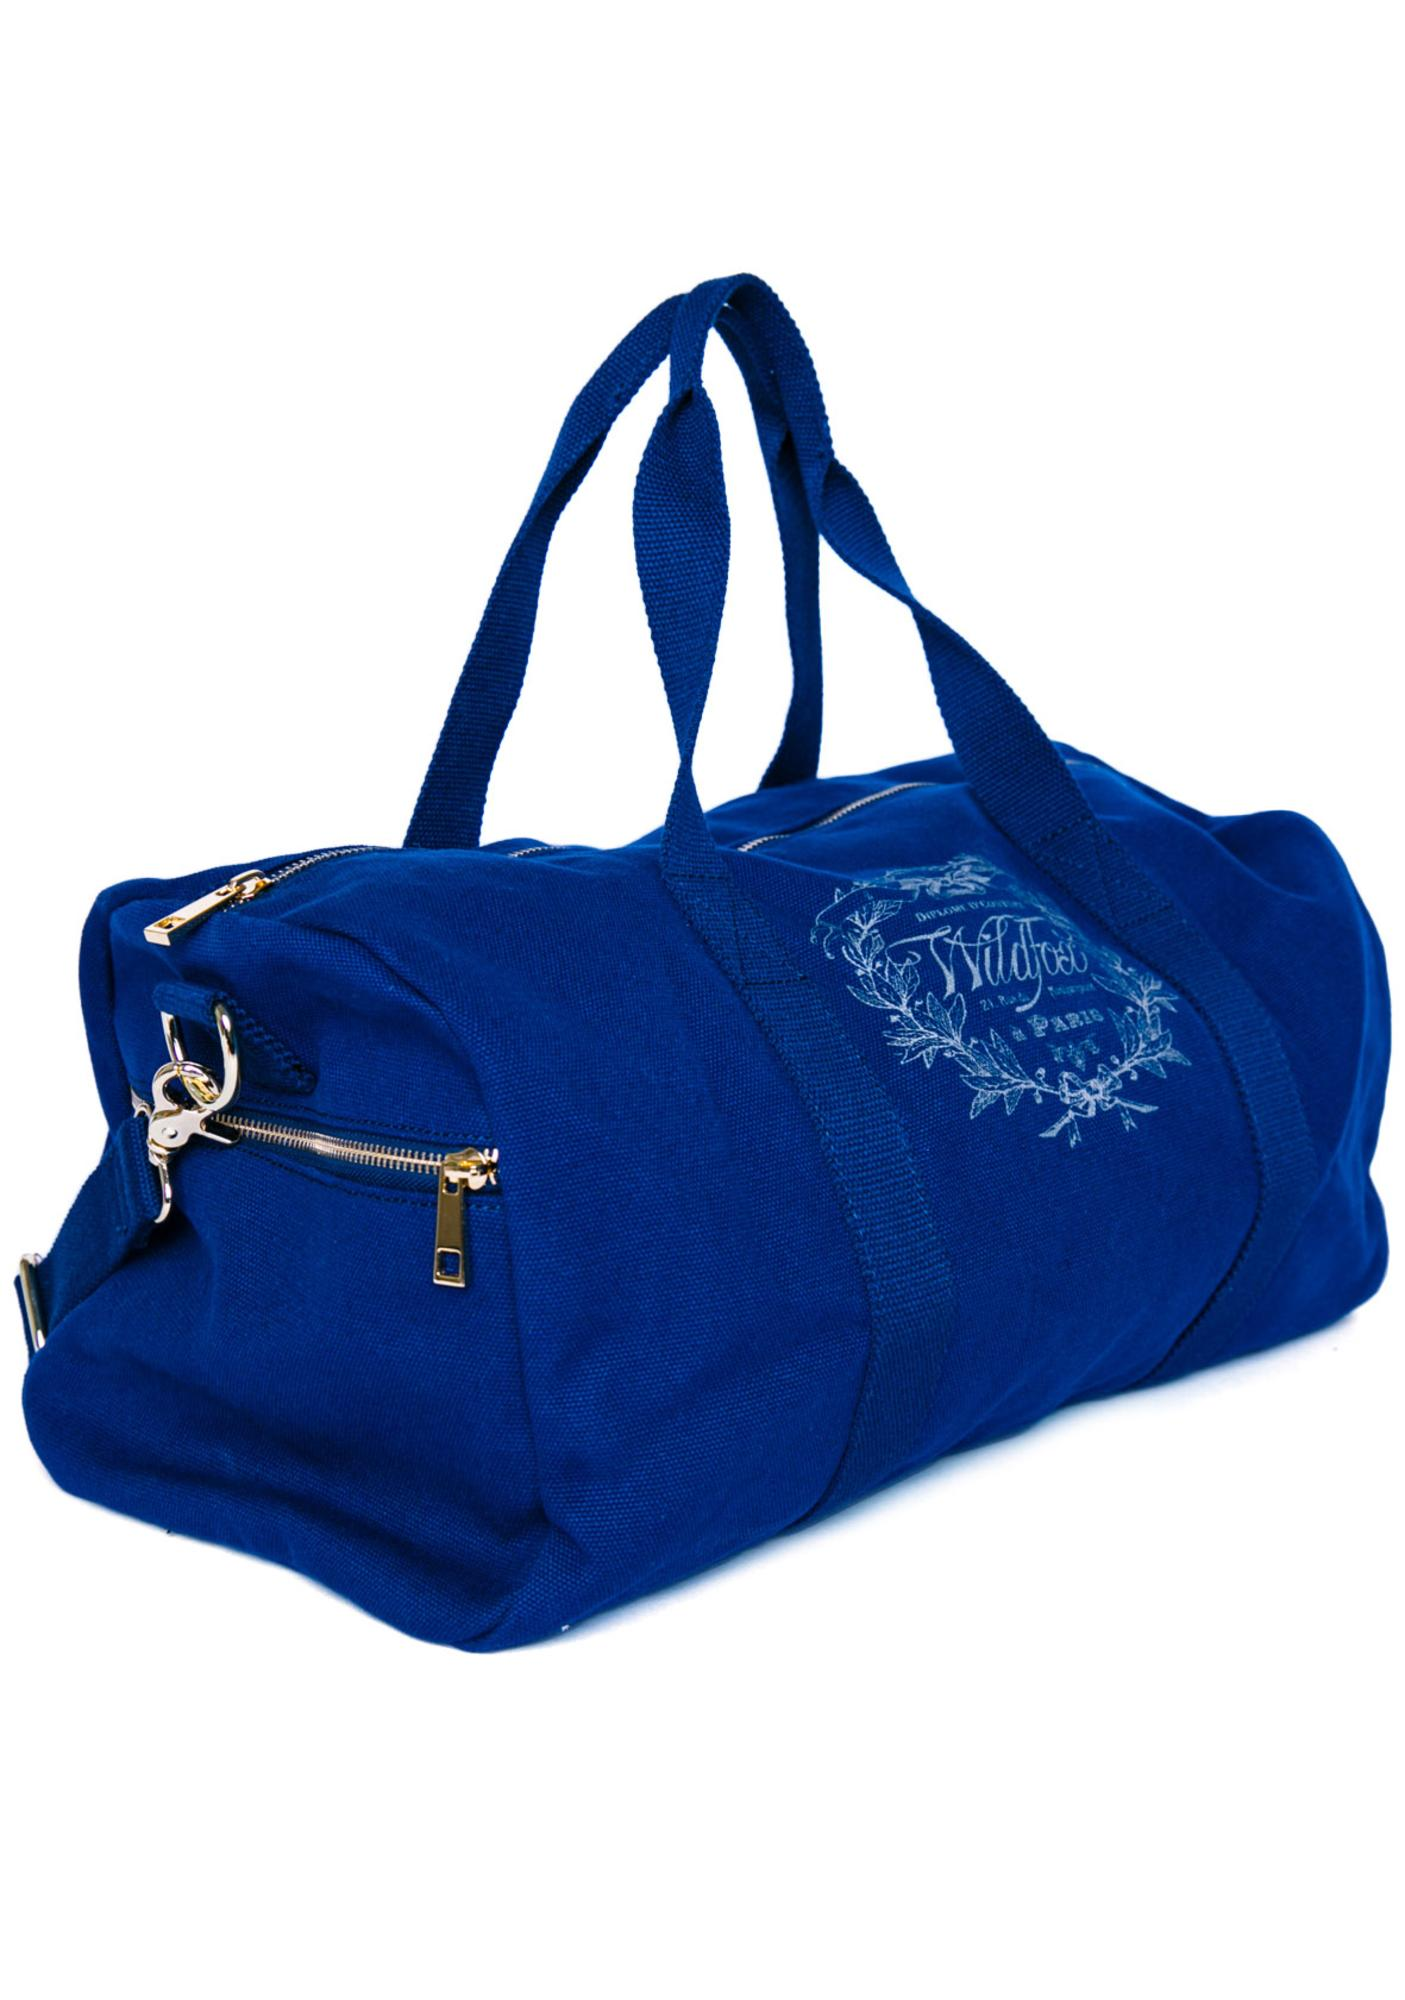 Wildfox Couture Paris Country Crest Gym Bag